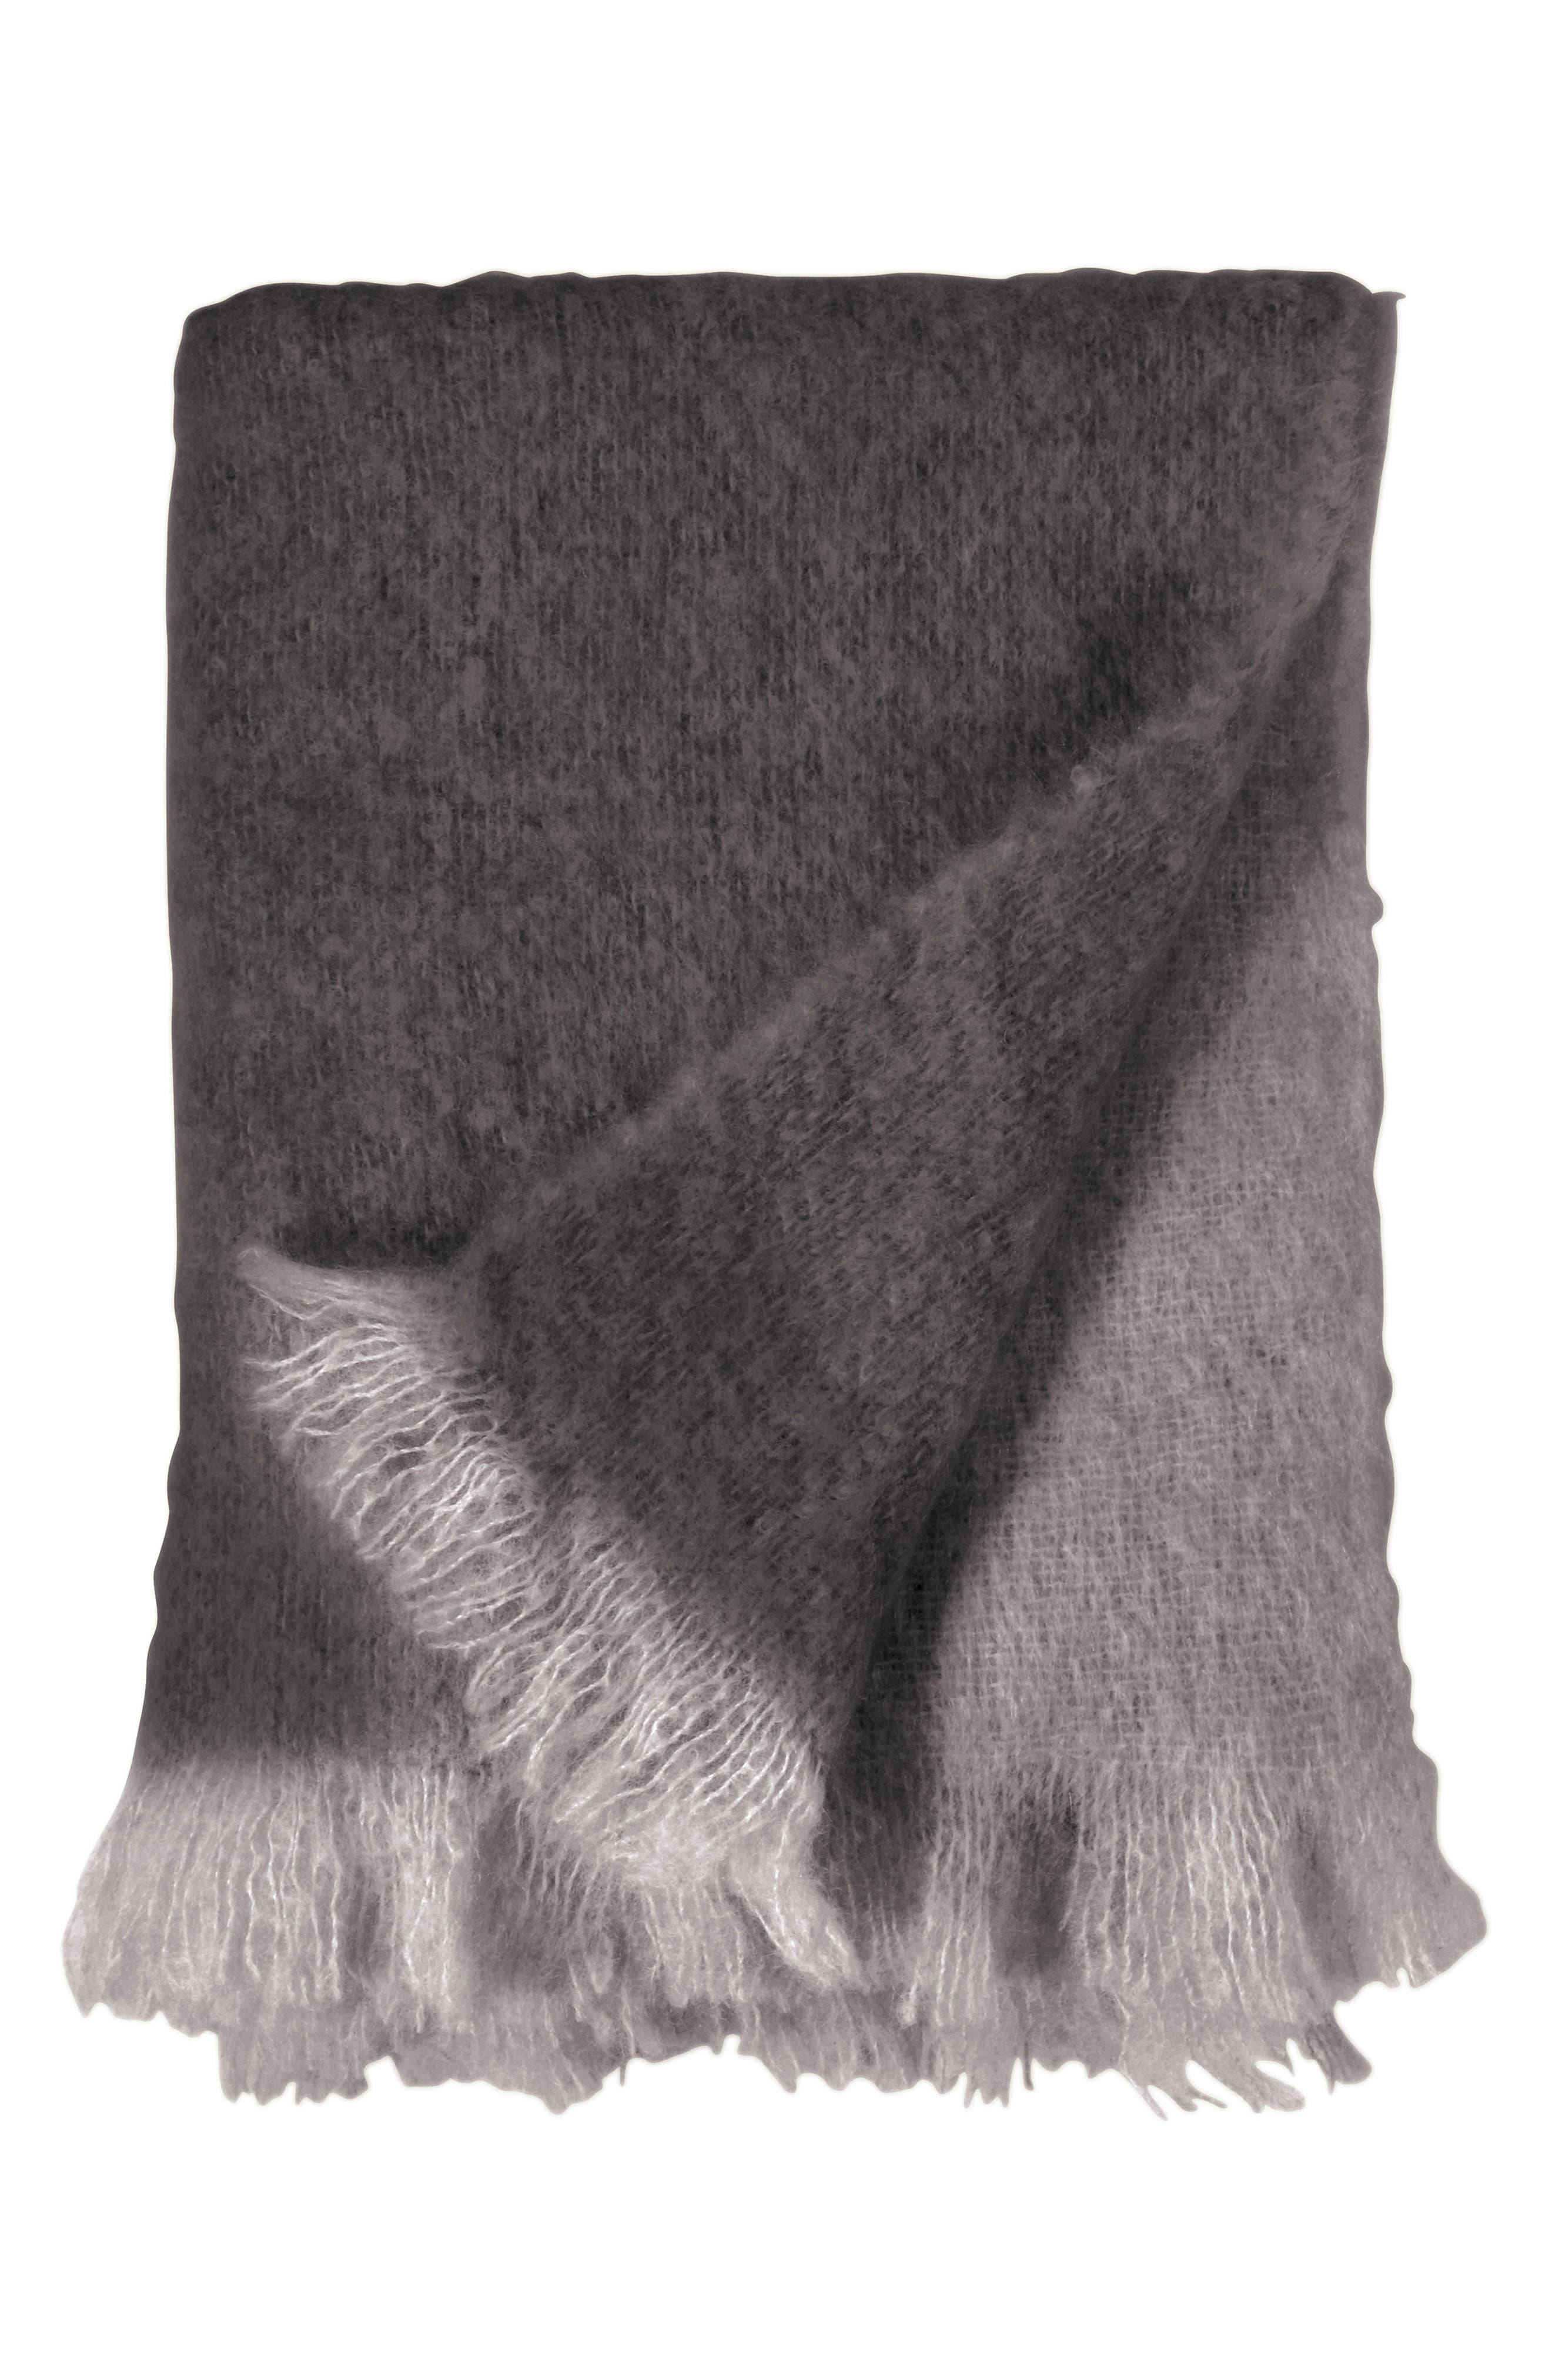 MICHAEL ARAM,                             Mohair & Wool Throw,                             Main thumbnail 1, color,                             CHARCOAL